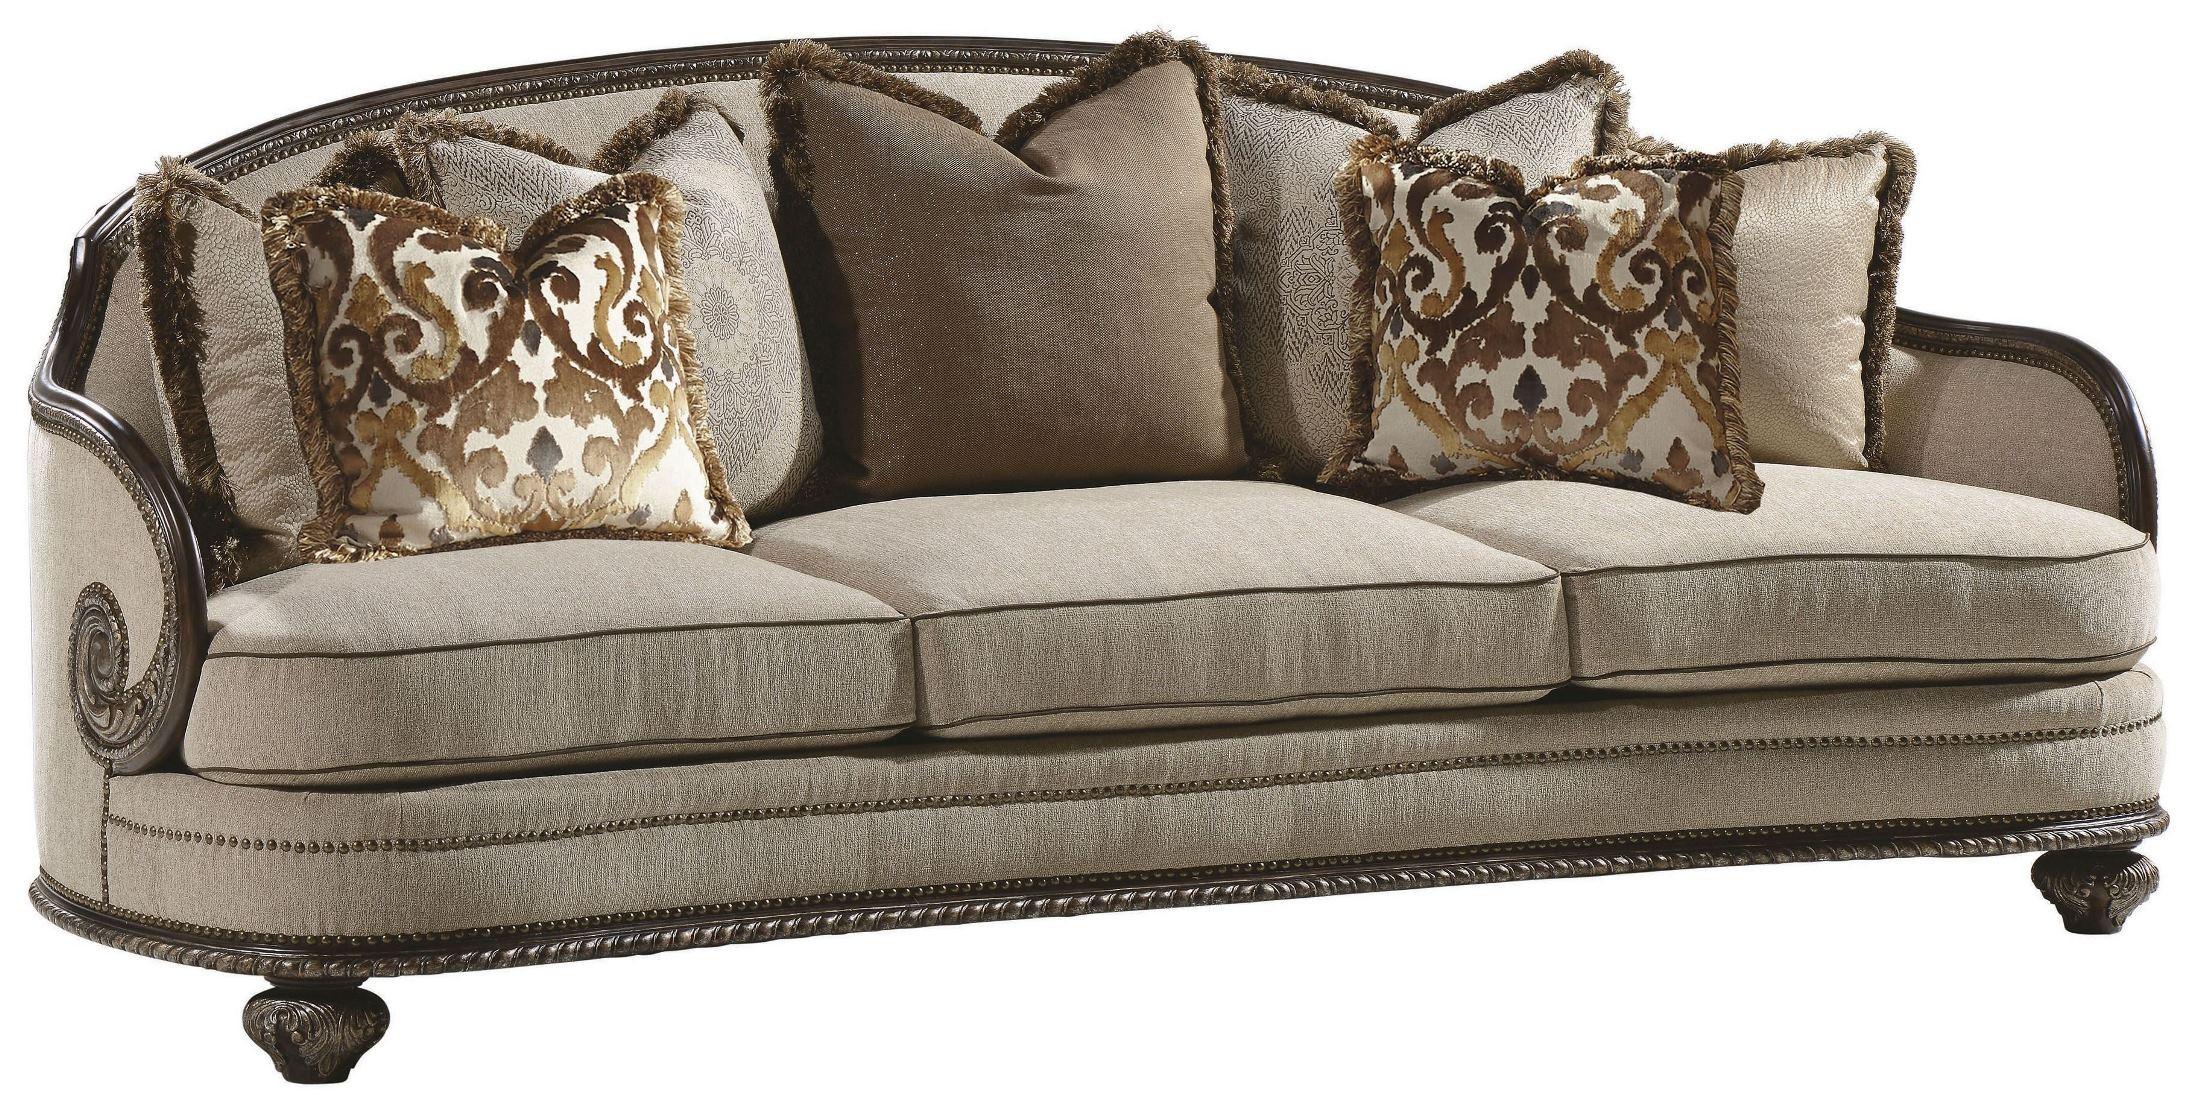 Delightful Chamberlain Sofa